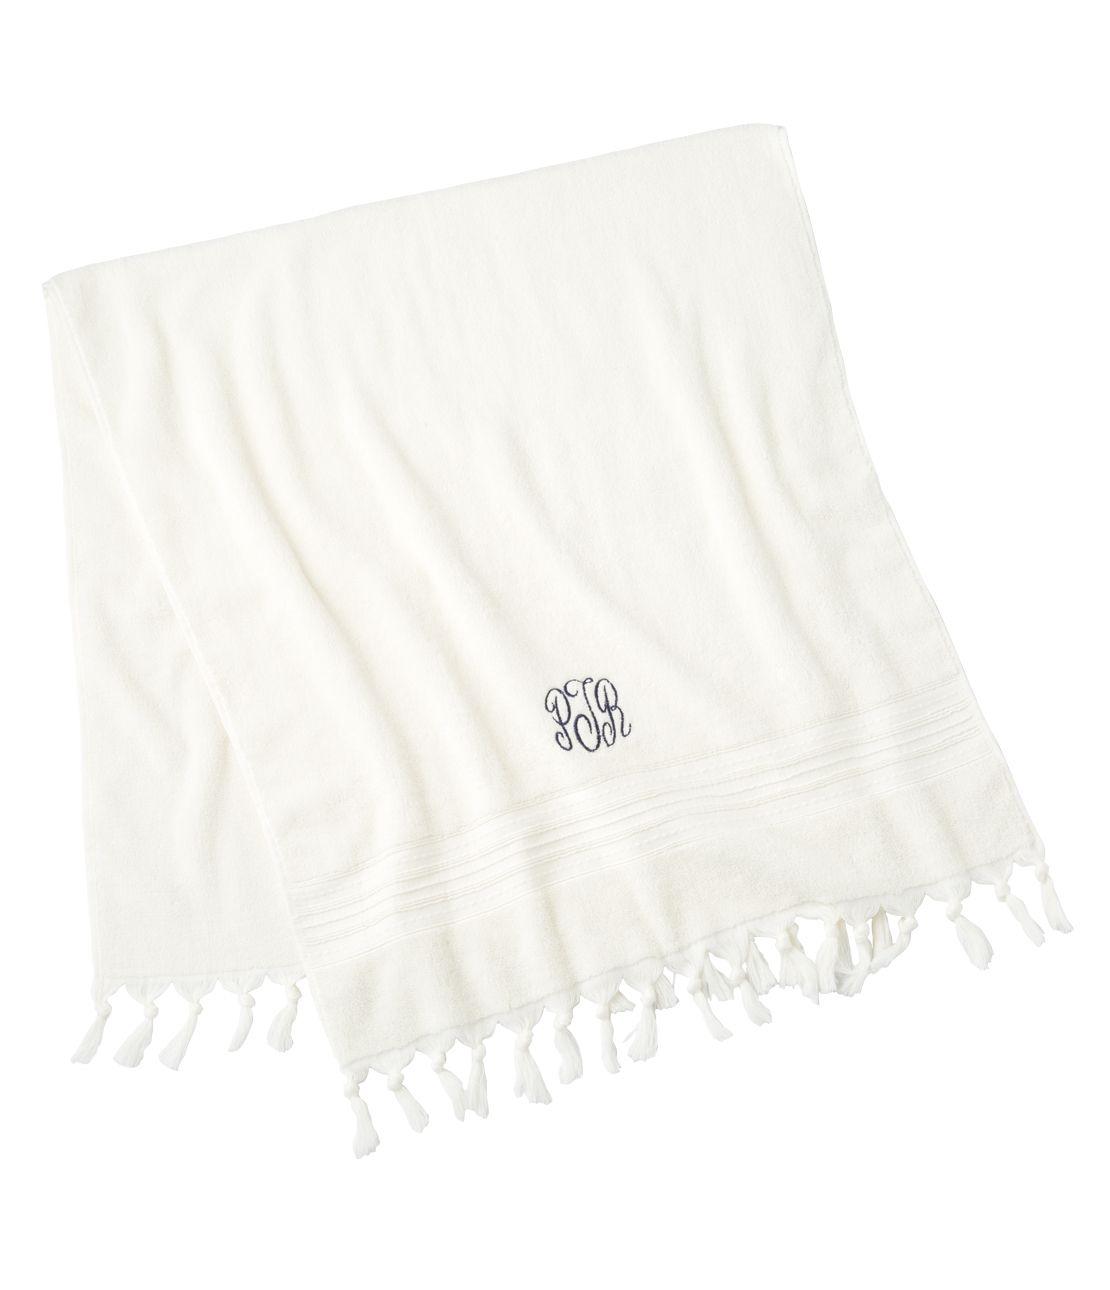 Tassel logo towel